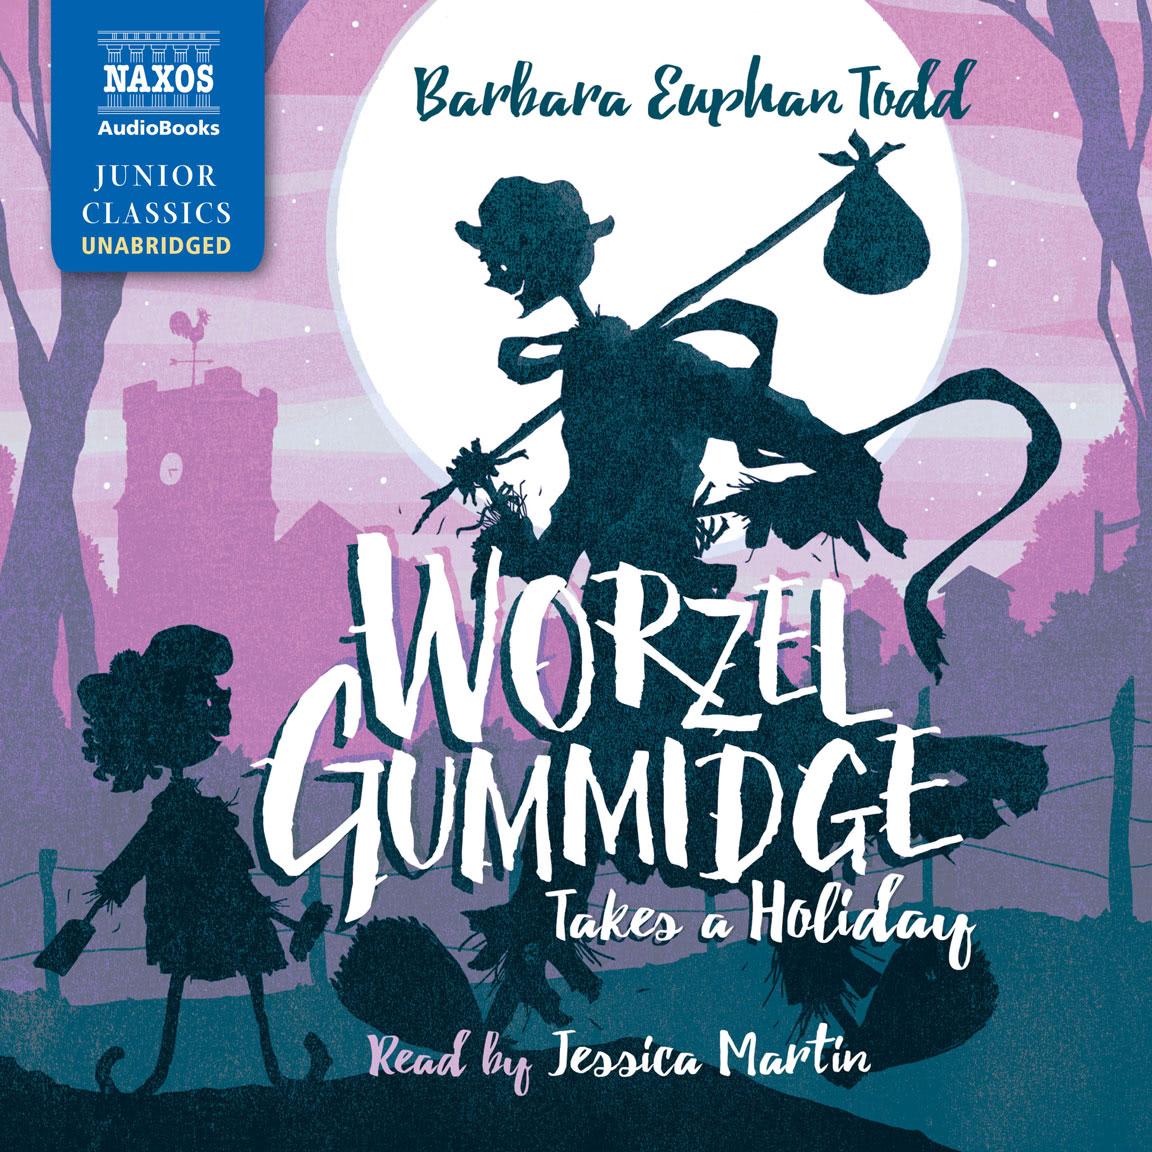 Worzel Gummidge Takes a Holiday (unabridged)